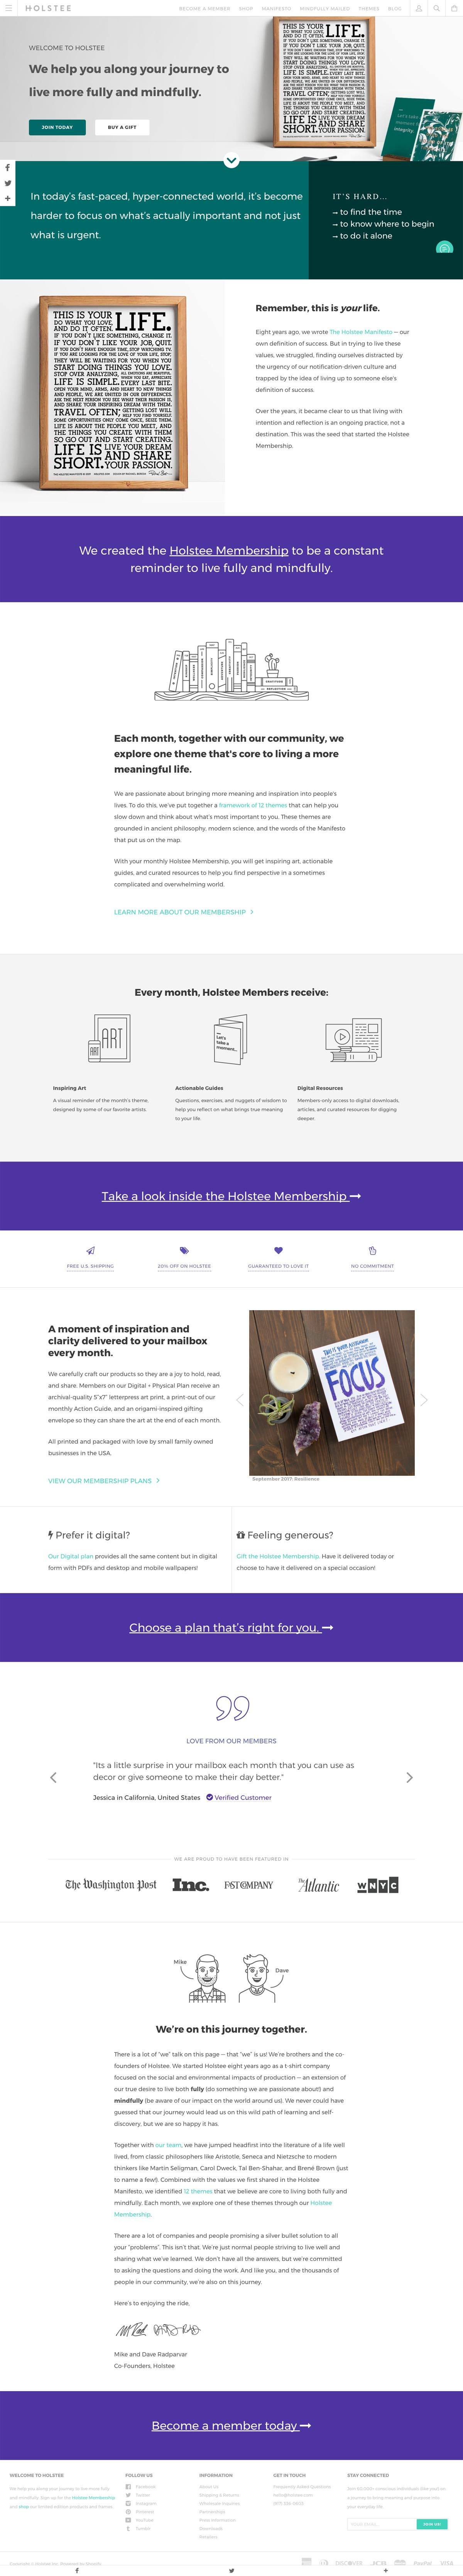 eCommerce website: Holstee